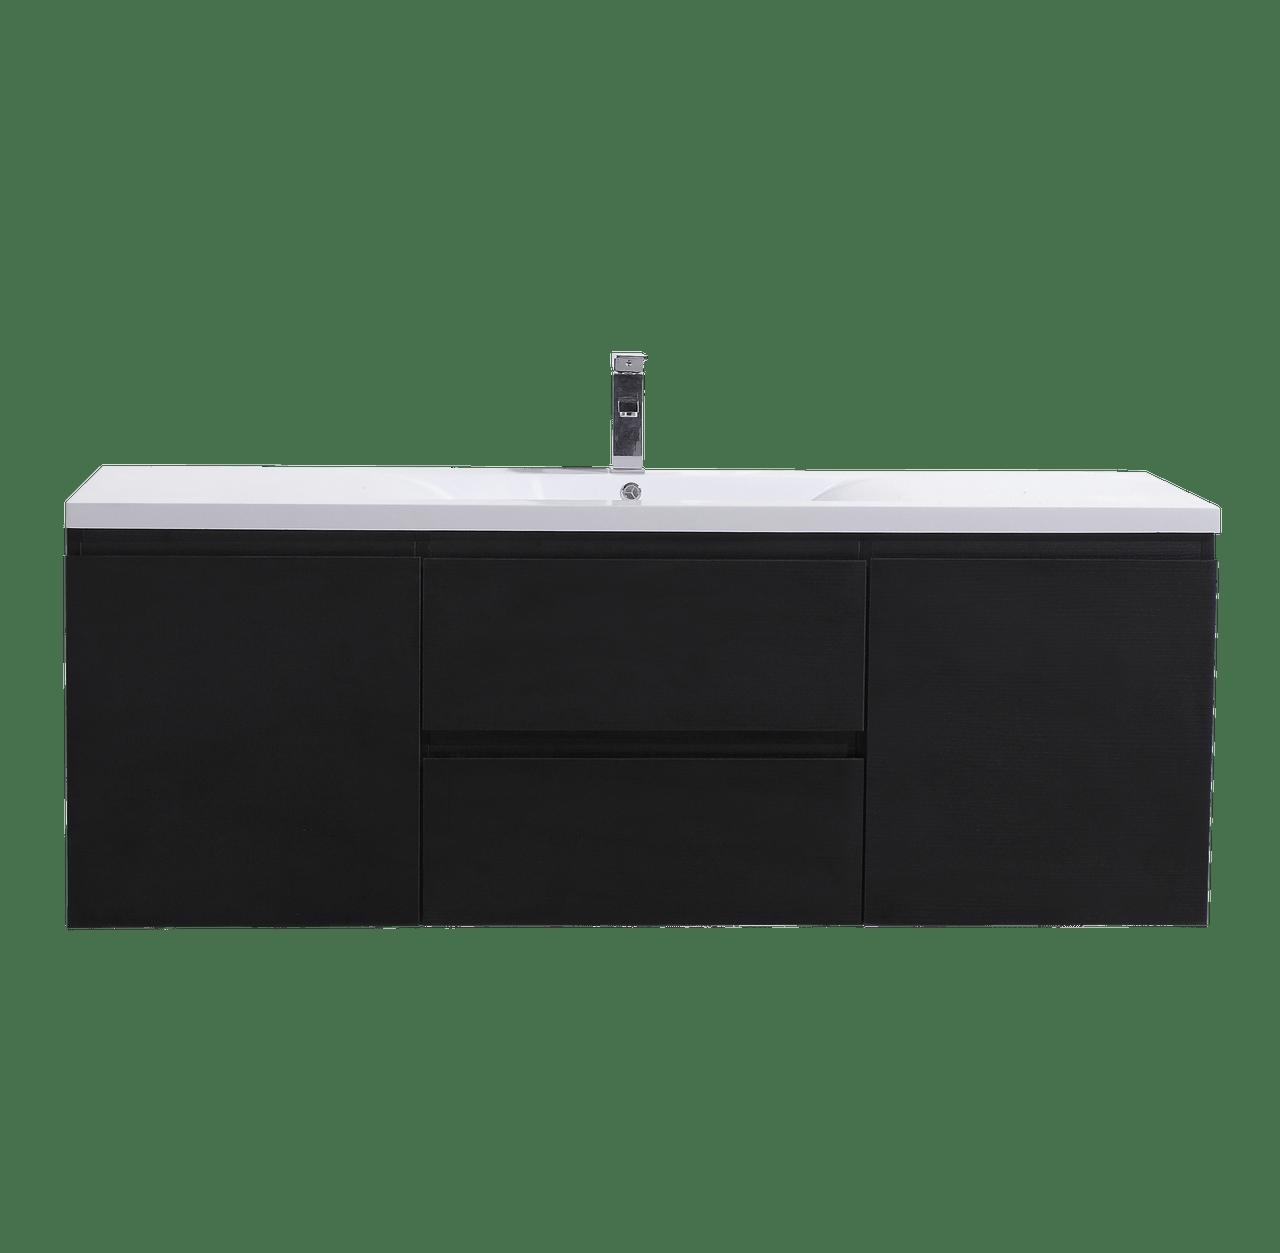 Moreno Mob 60 Single Sink Black Wall Mounted Modern Bathroom Vanity With Reeinforced Acrylic Sink Bathroom Vanities Wholesale Inc